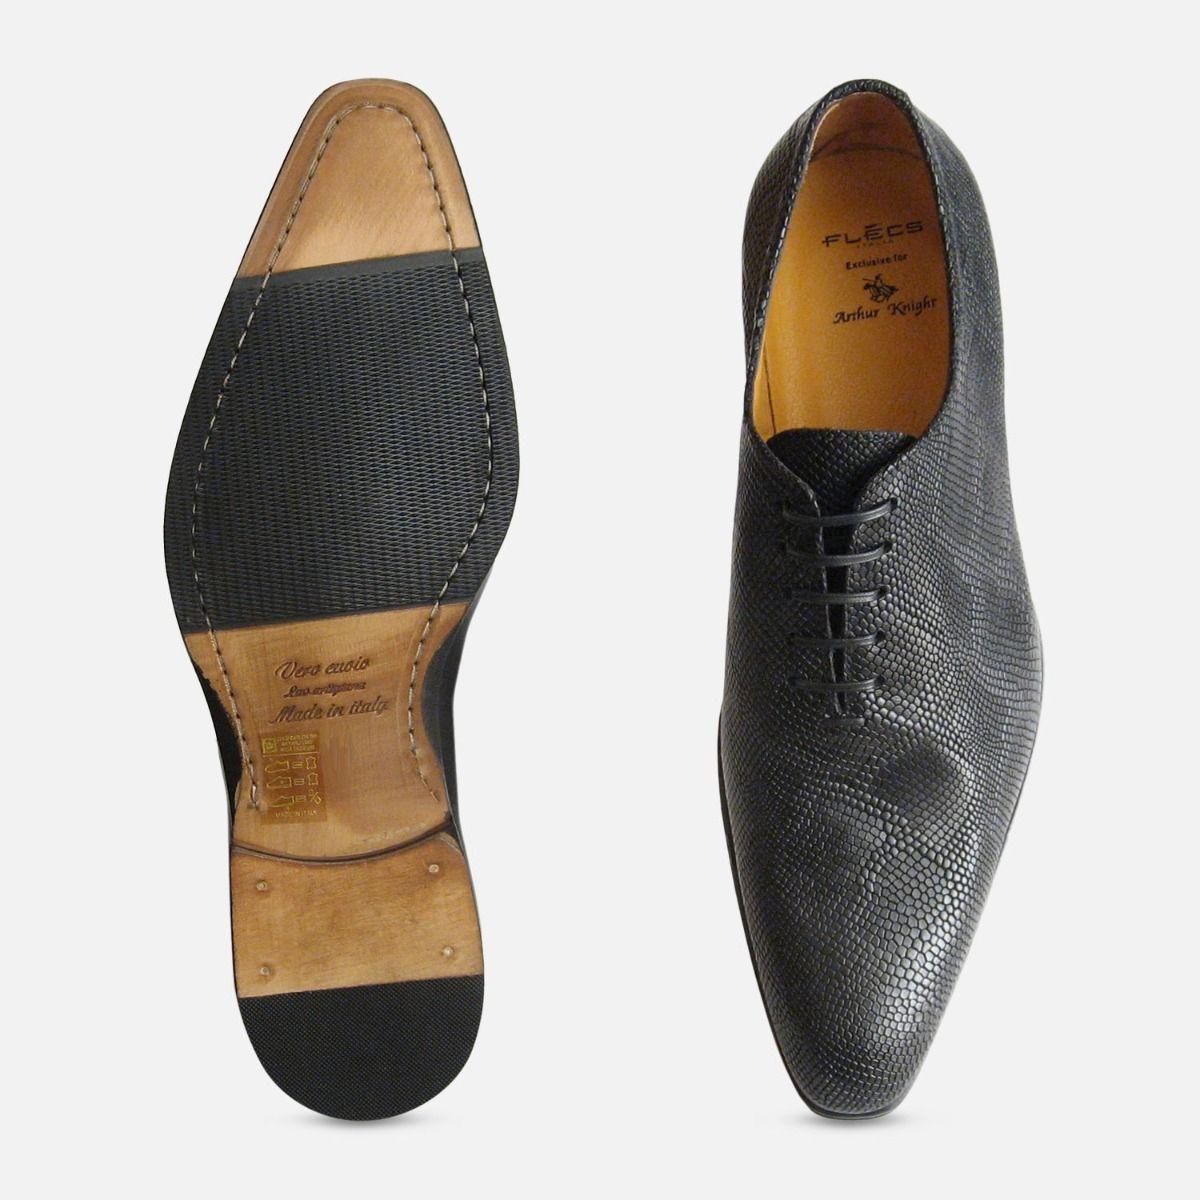 Designer Black Lizard Skin Whole Cut Iguana Mens Italian Shoes